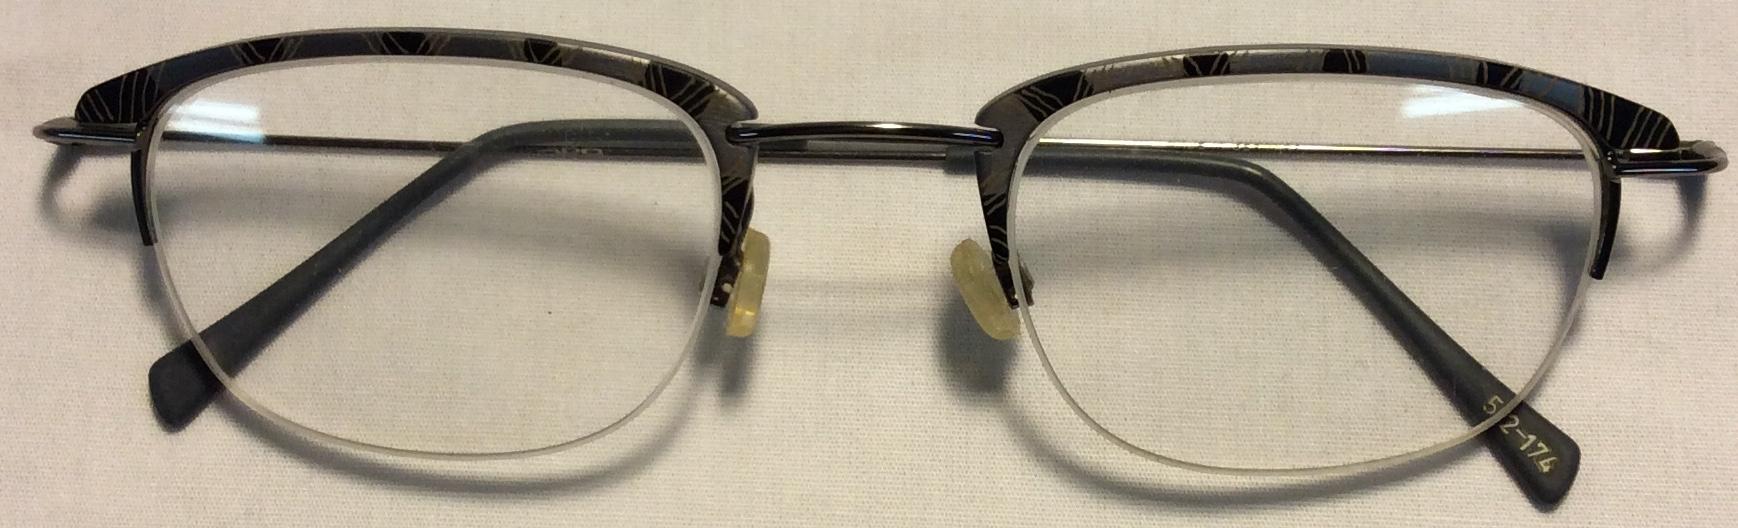 Mikado Thin silver metal frames